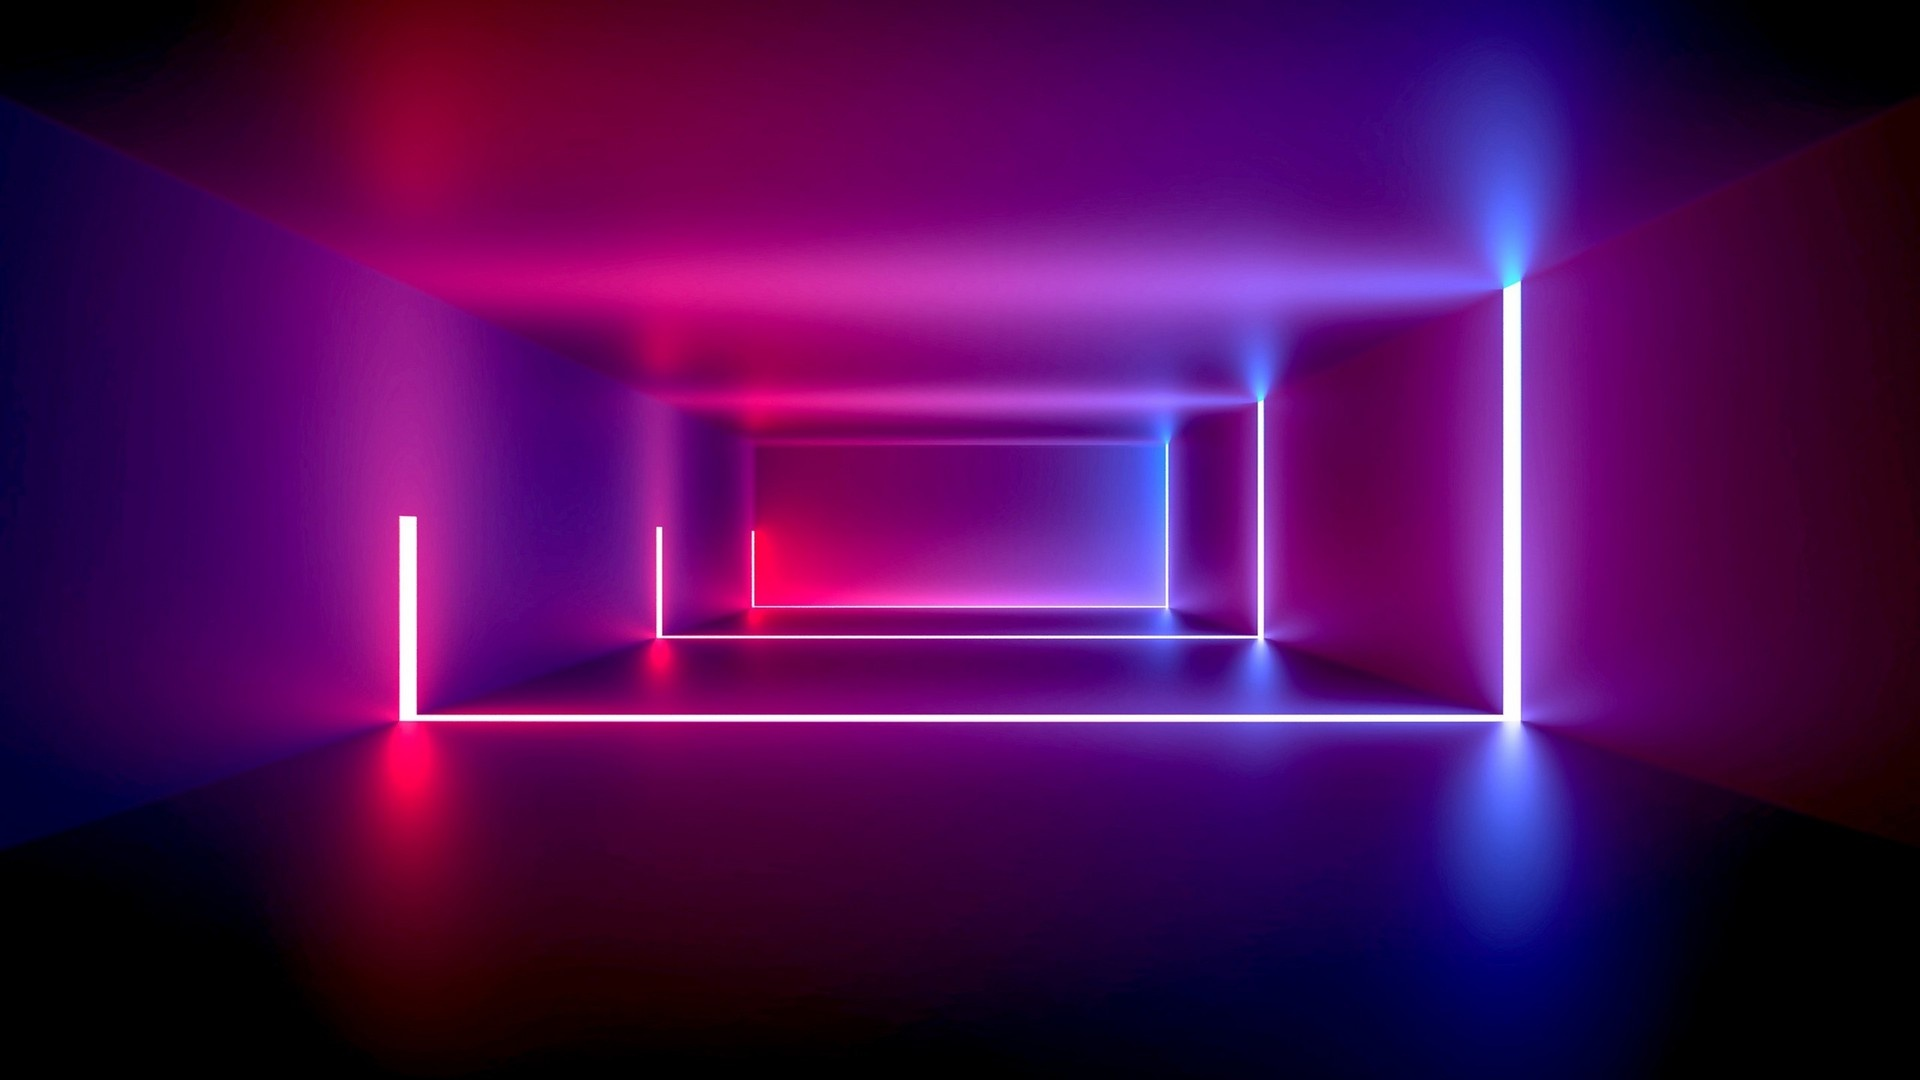 Neon best picture